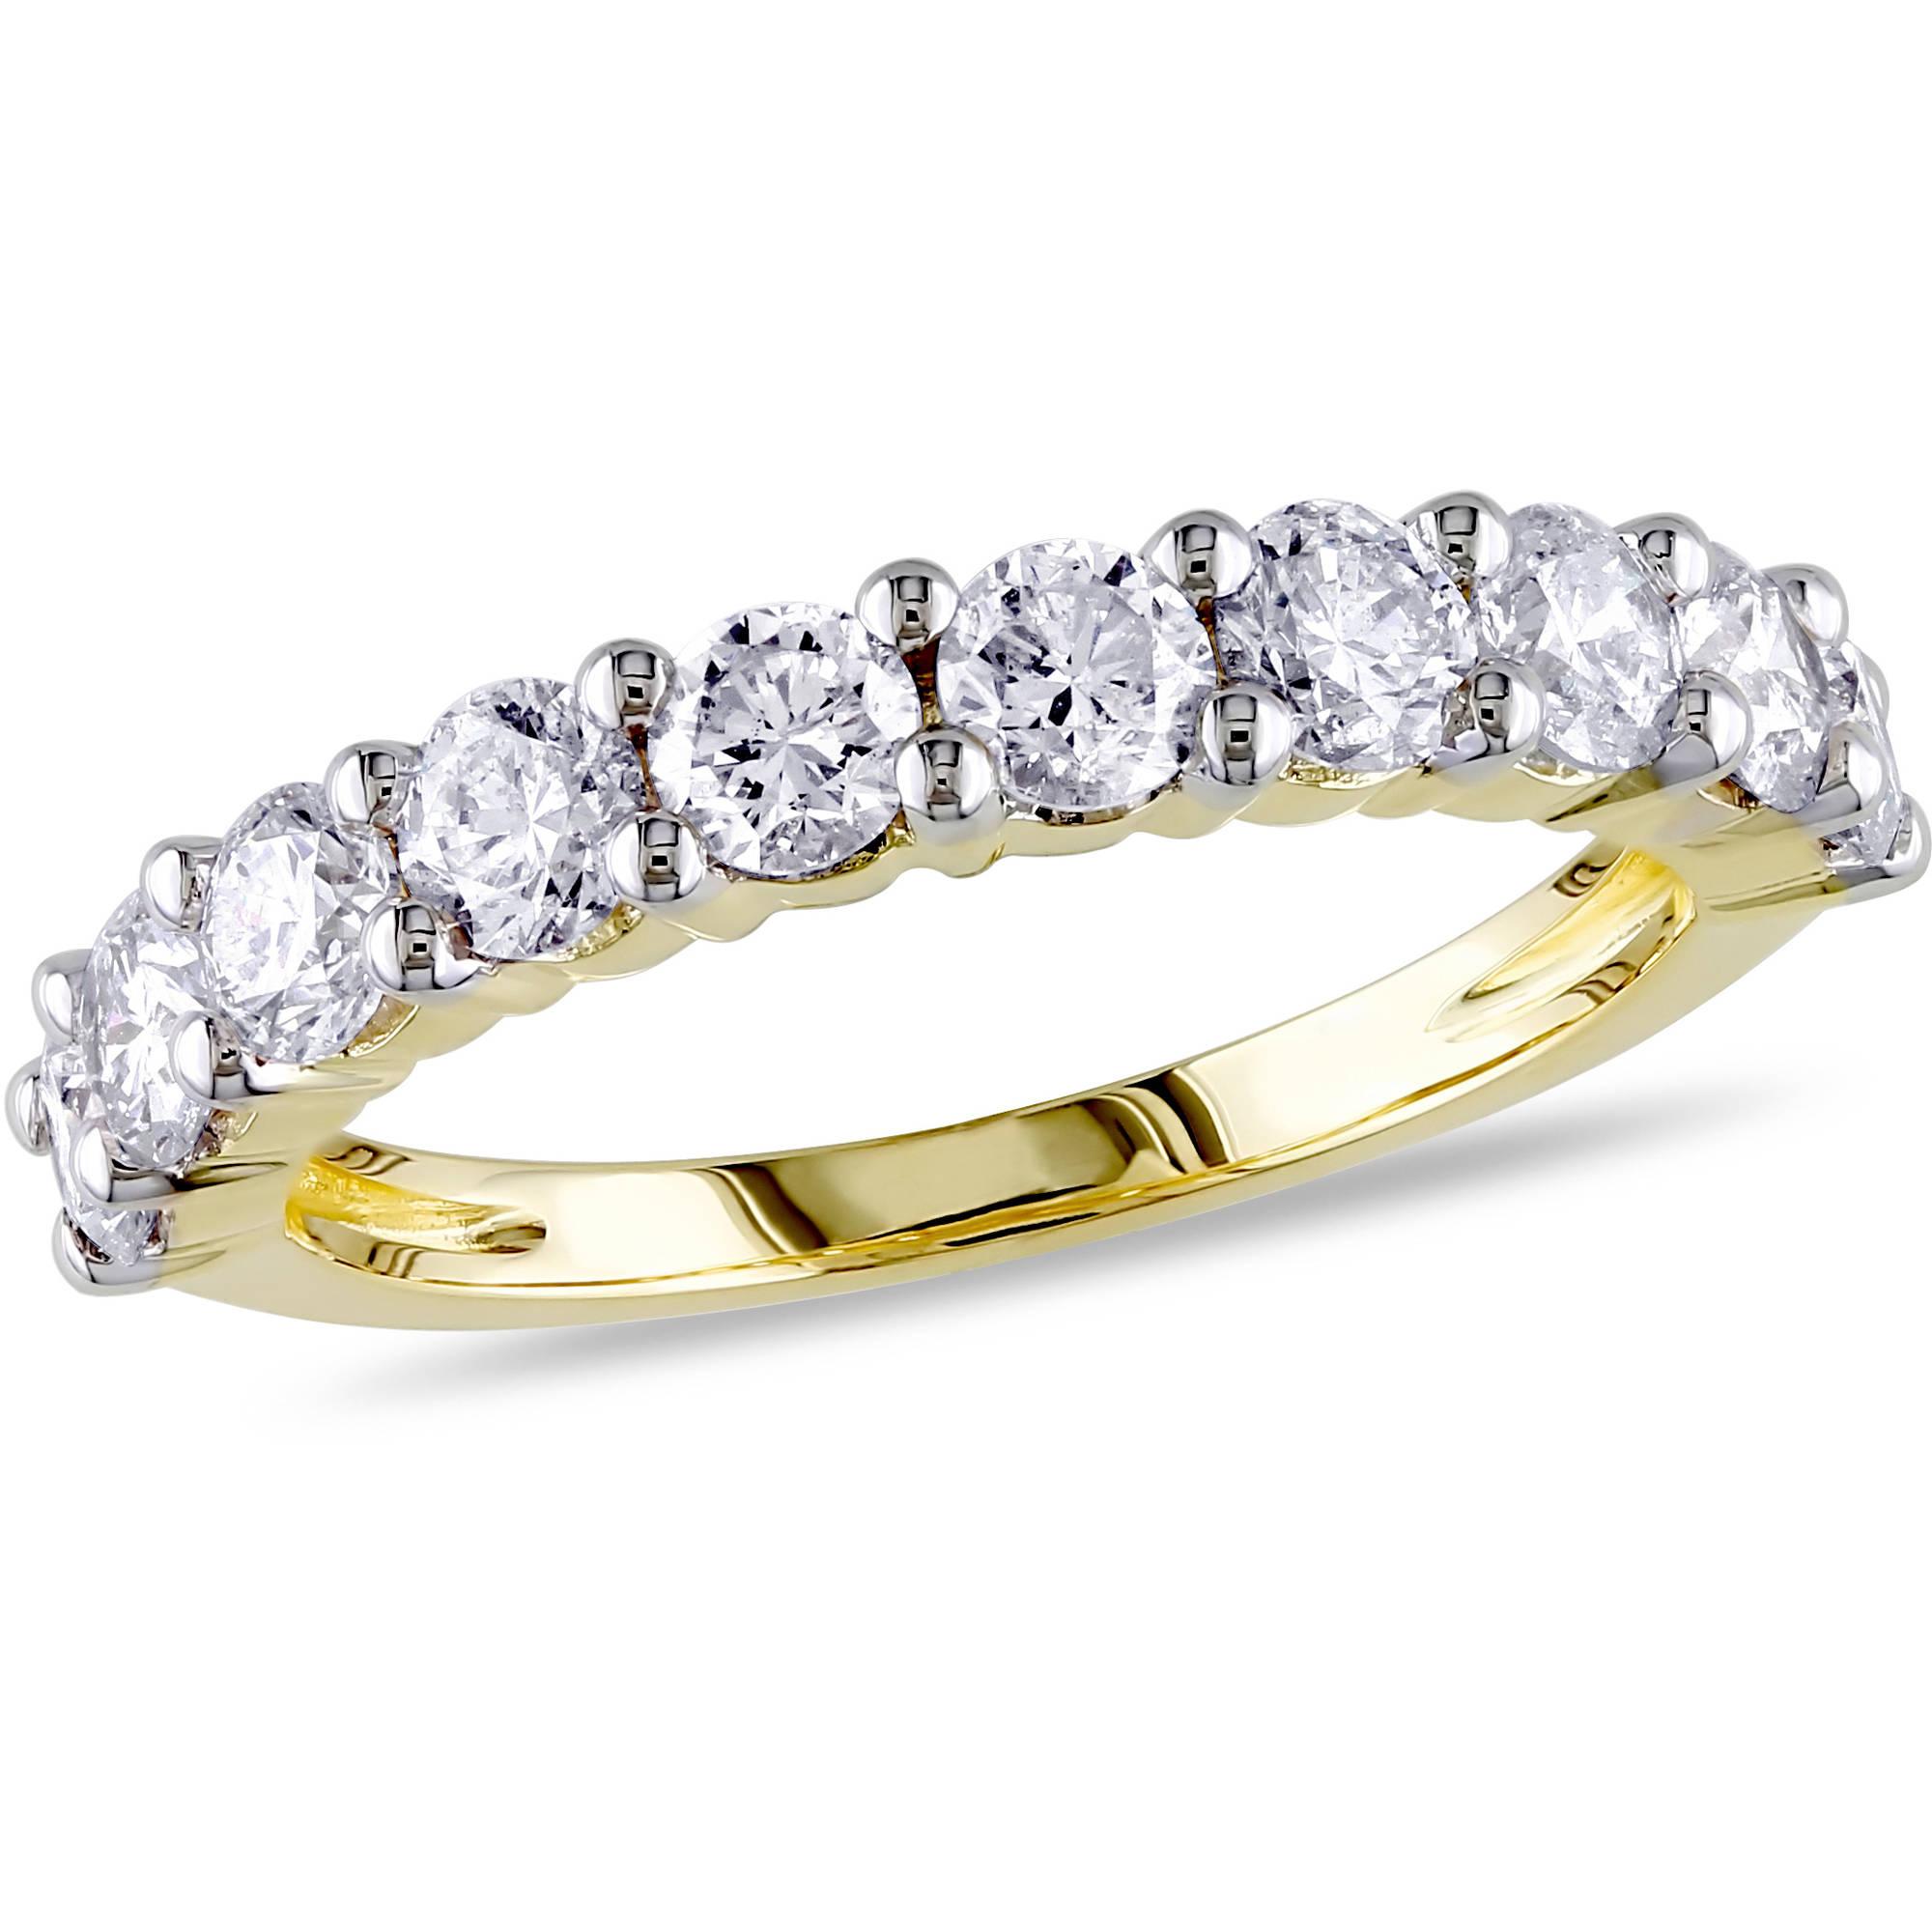 Miabella 1-1/2 Carat T.W. Diamond 14kt Yellow Gold Semi-Eternity Anniversary Ring